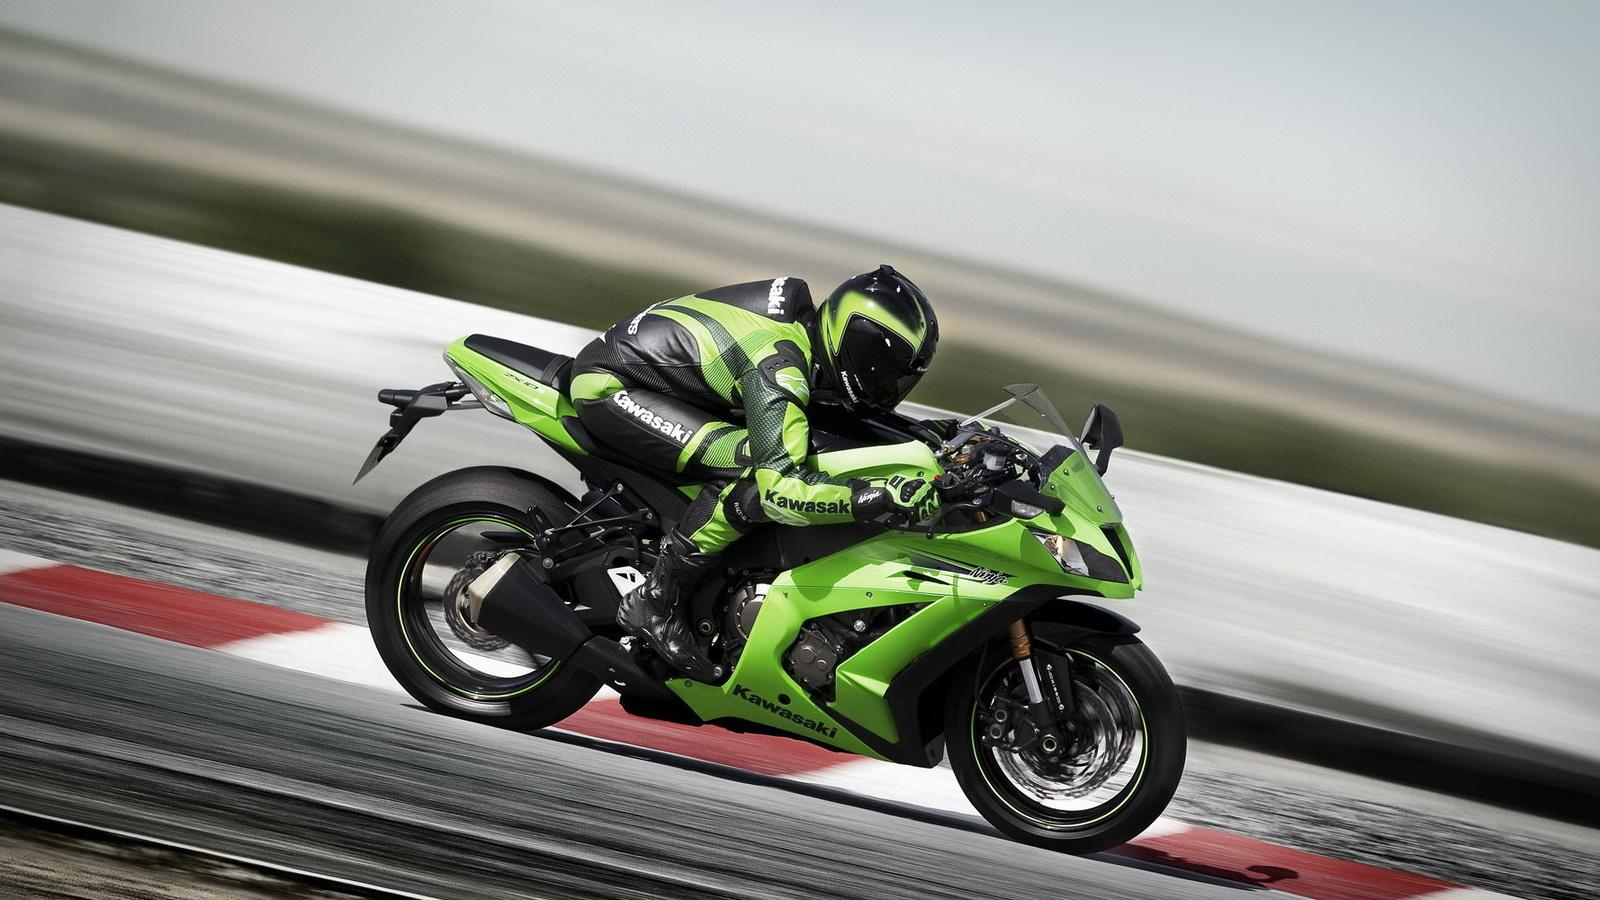 Kawasaki Ninja ZX 10R Photo For Desktop Wallpaper